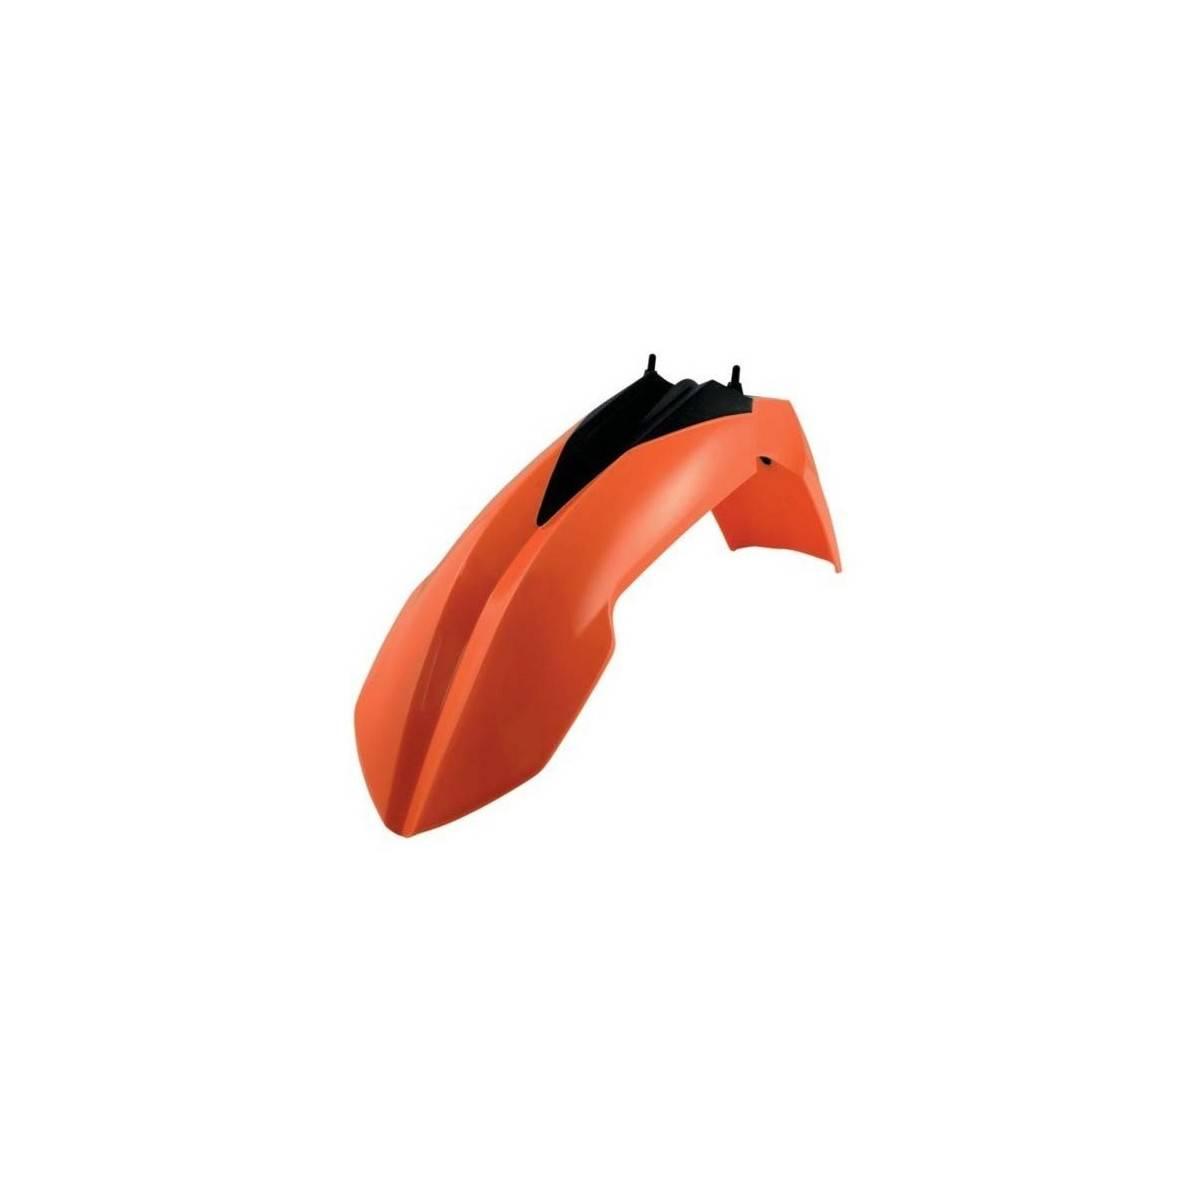 0021812-011 - Guardabarros Delantero Ktm Sx 65 16 18 Naranja Negro